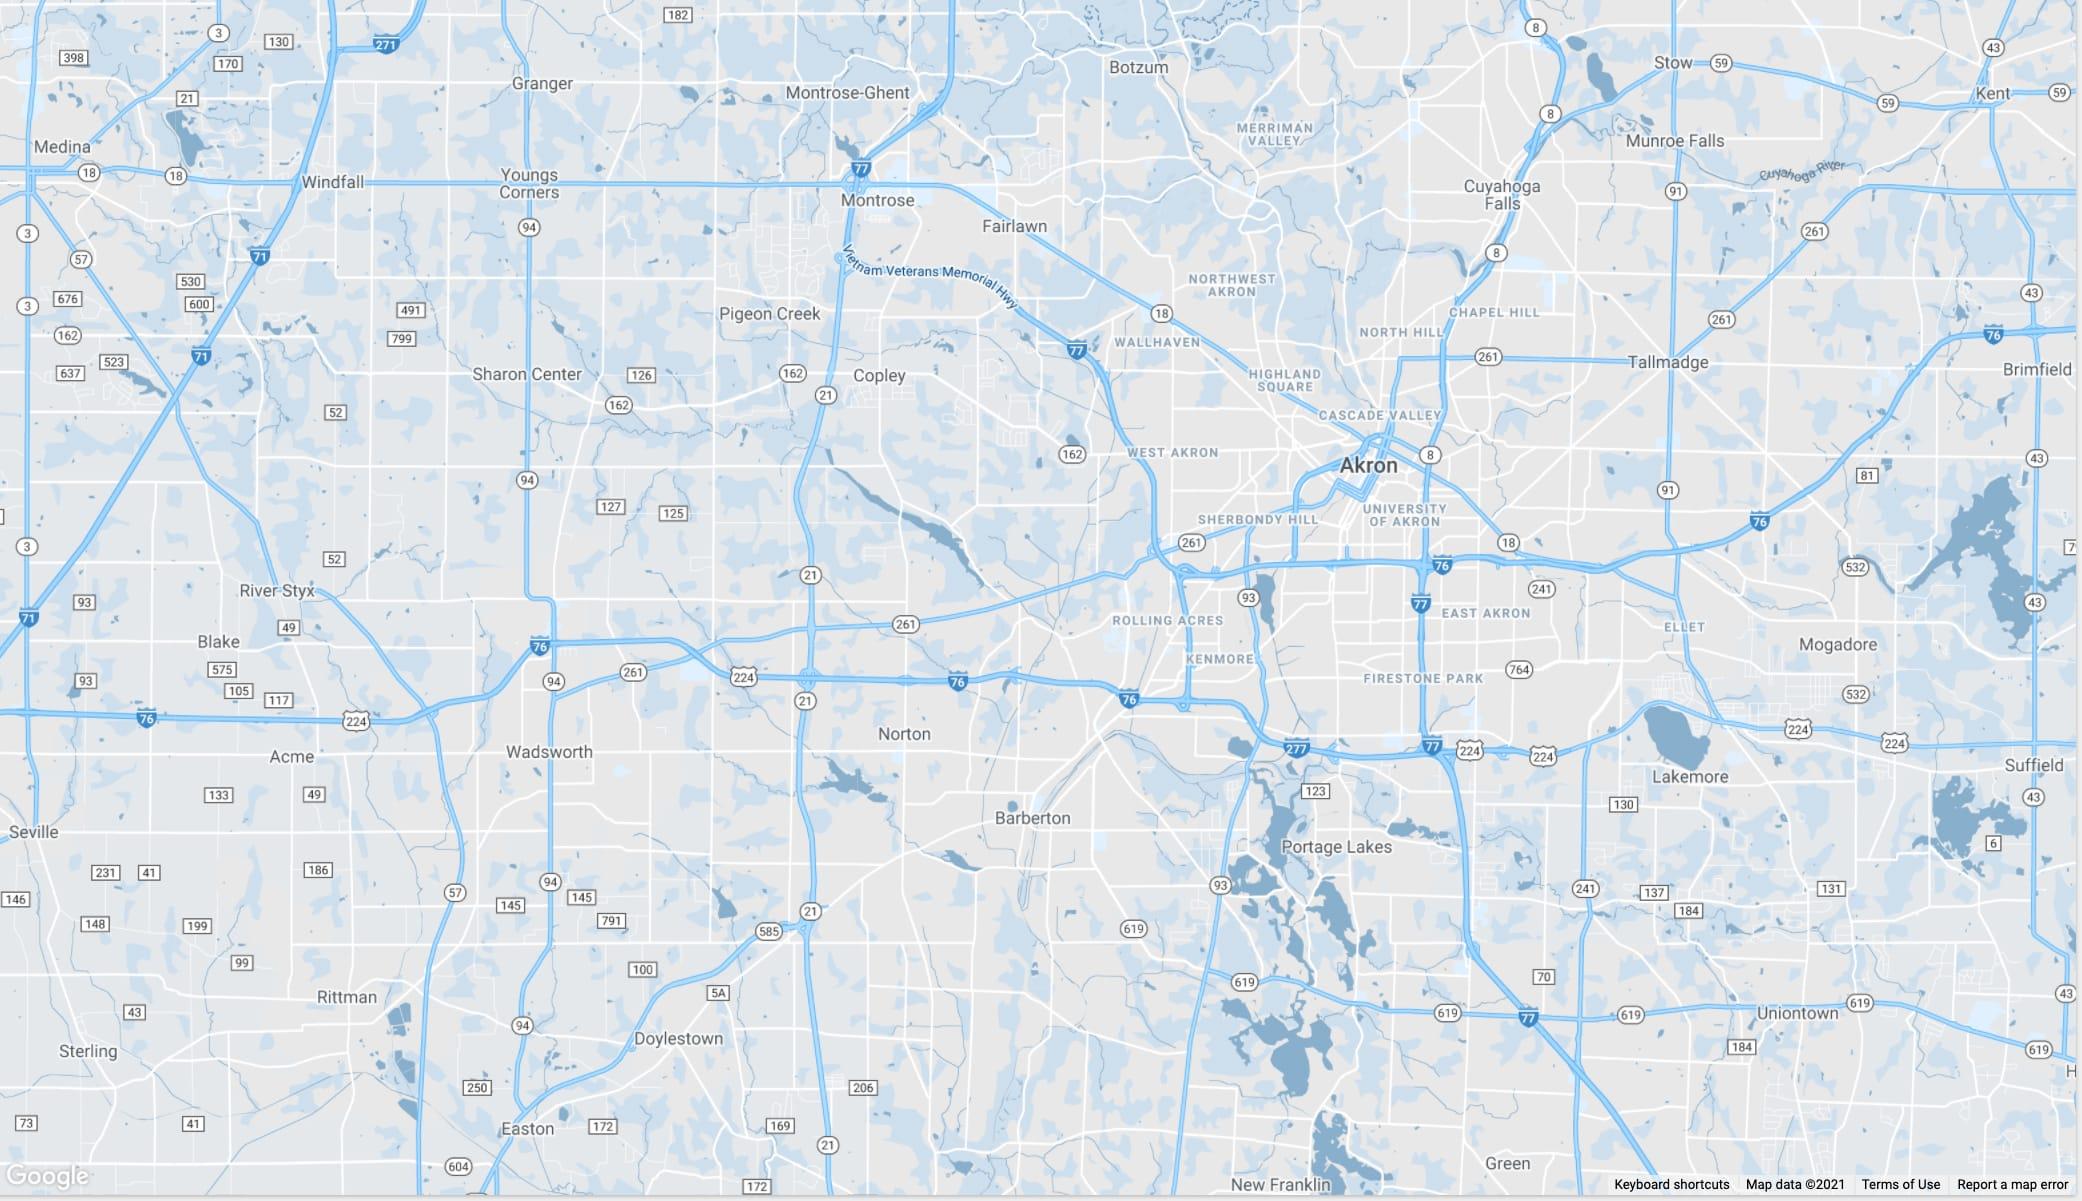 Wadsworth and Akron, Ohio area map